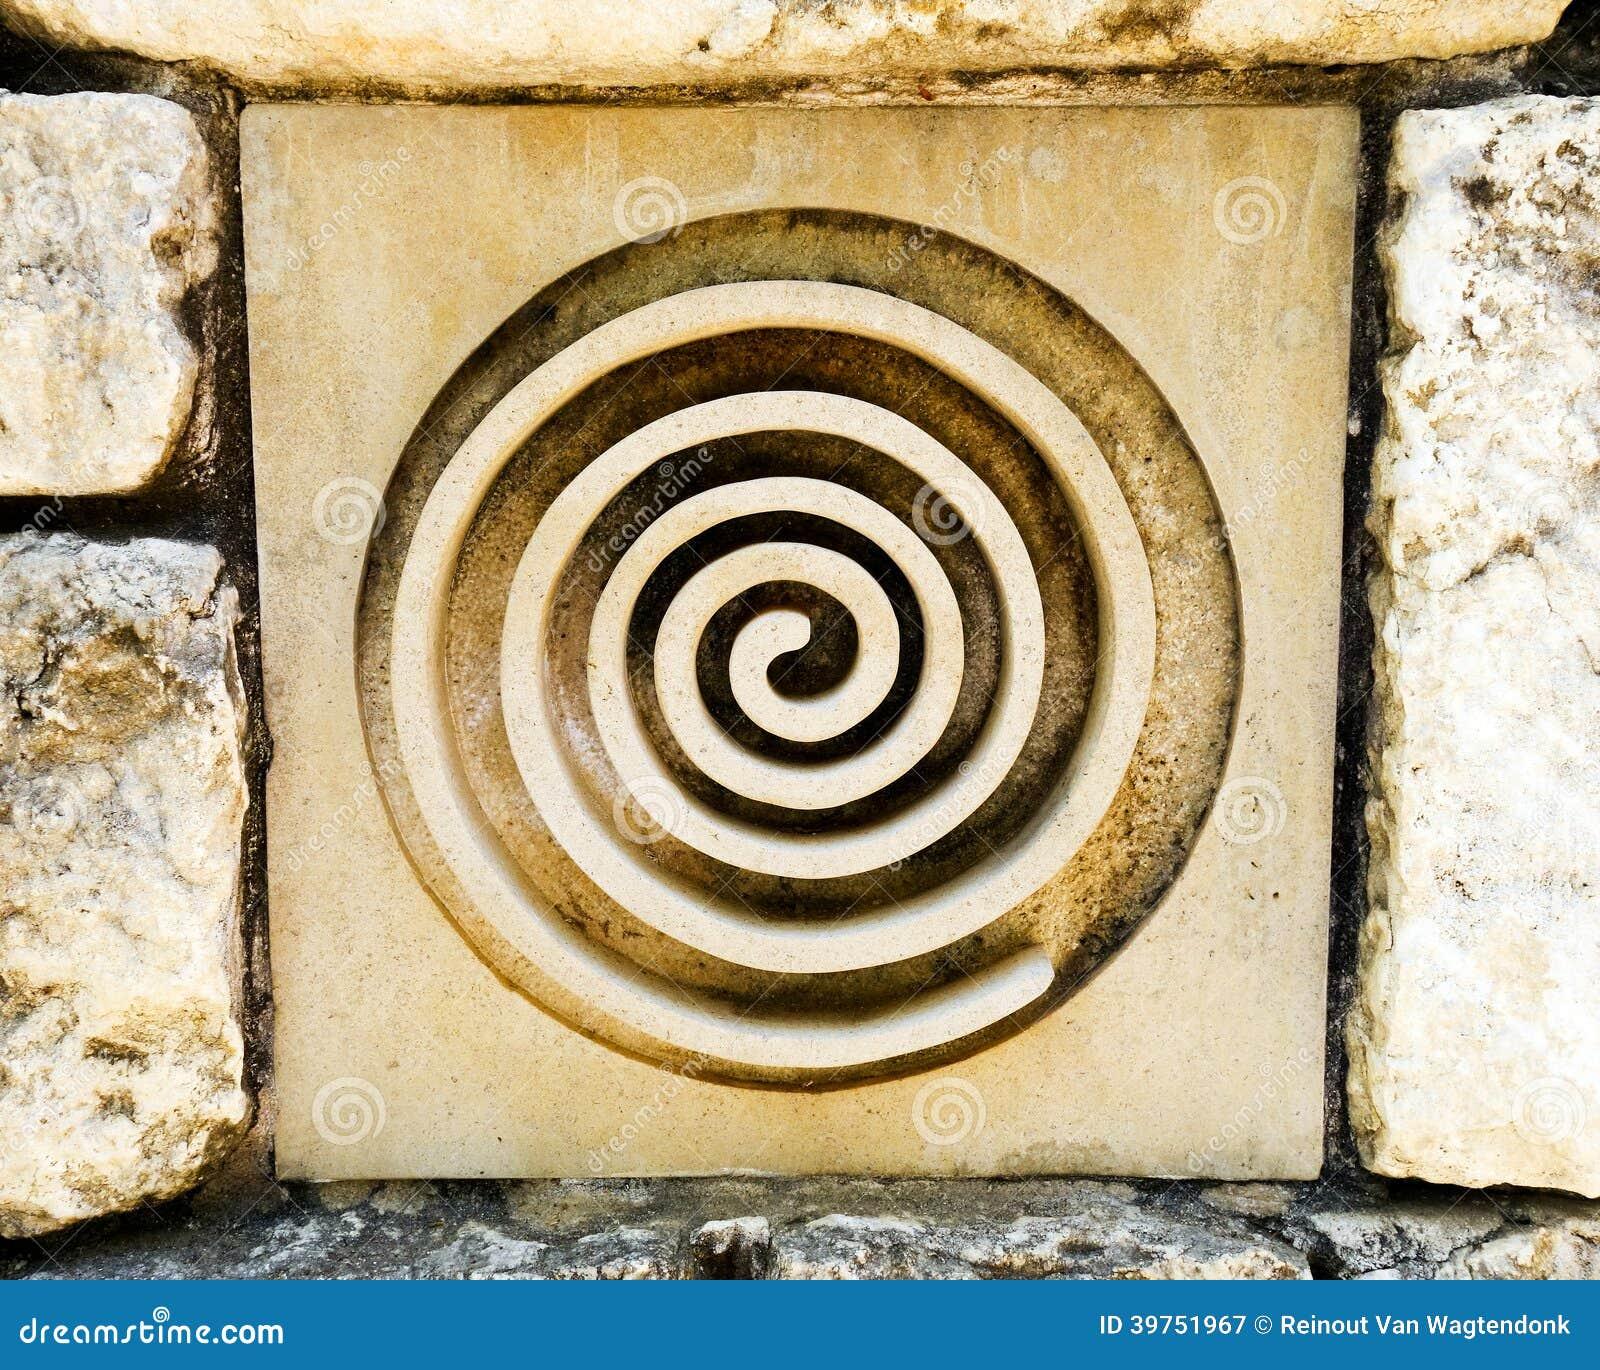 Celtic Or Goddess Symbol Stock Image Image Of Druid 39751967